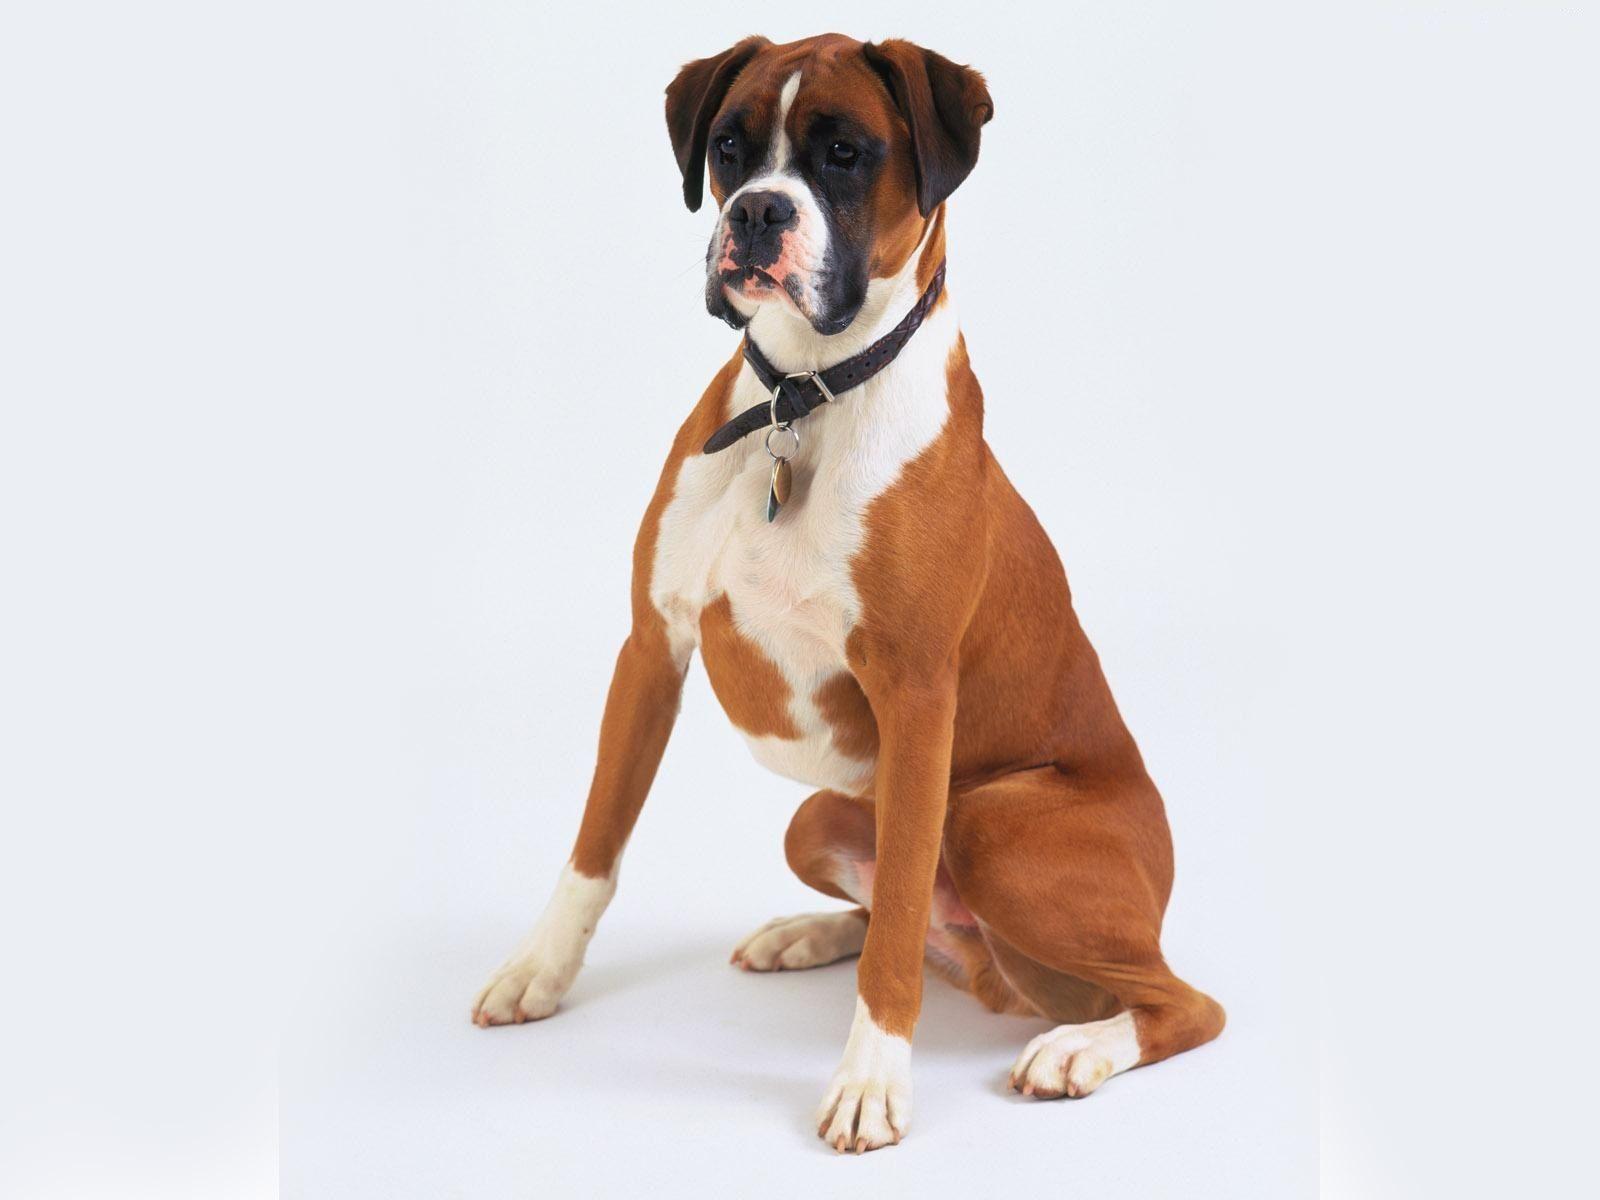 Boxer Dog Computer Wallpaper Desktop Background 1600x1200 Id 355644 Female Boxer Dog Boxer Dogs Boxer Puppies